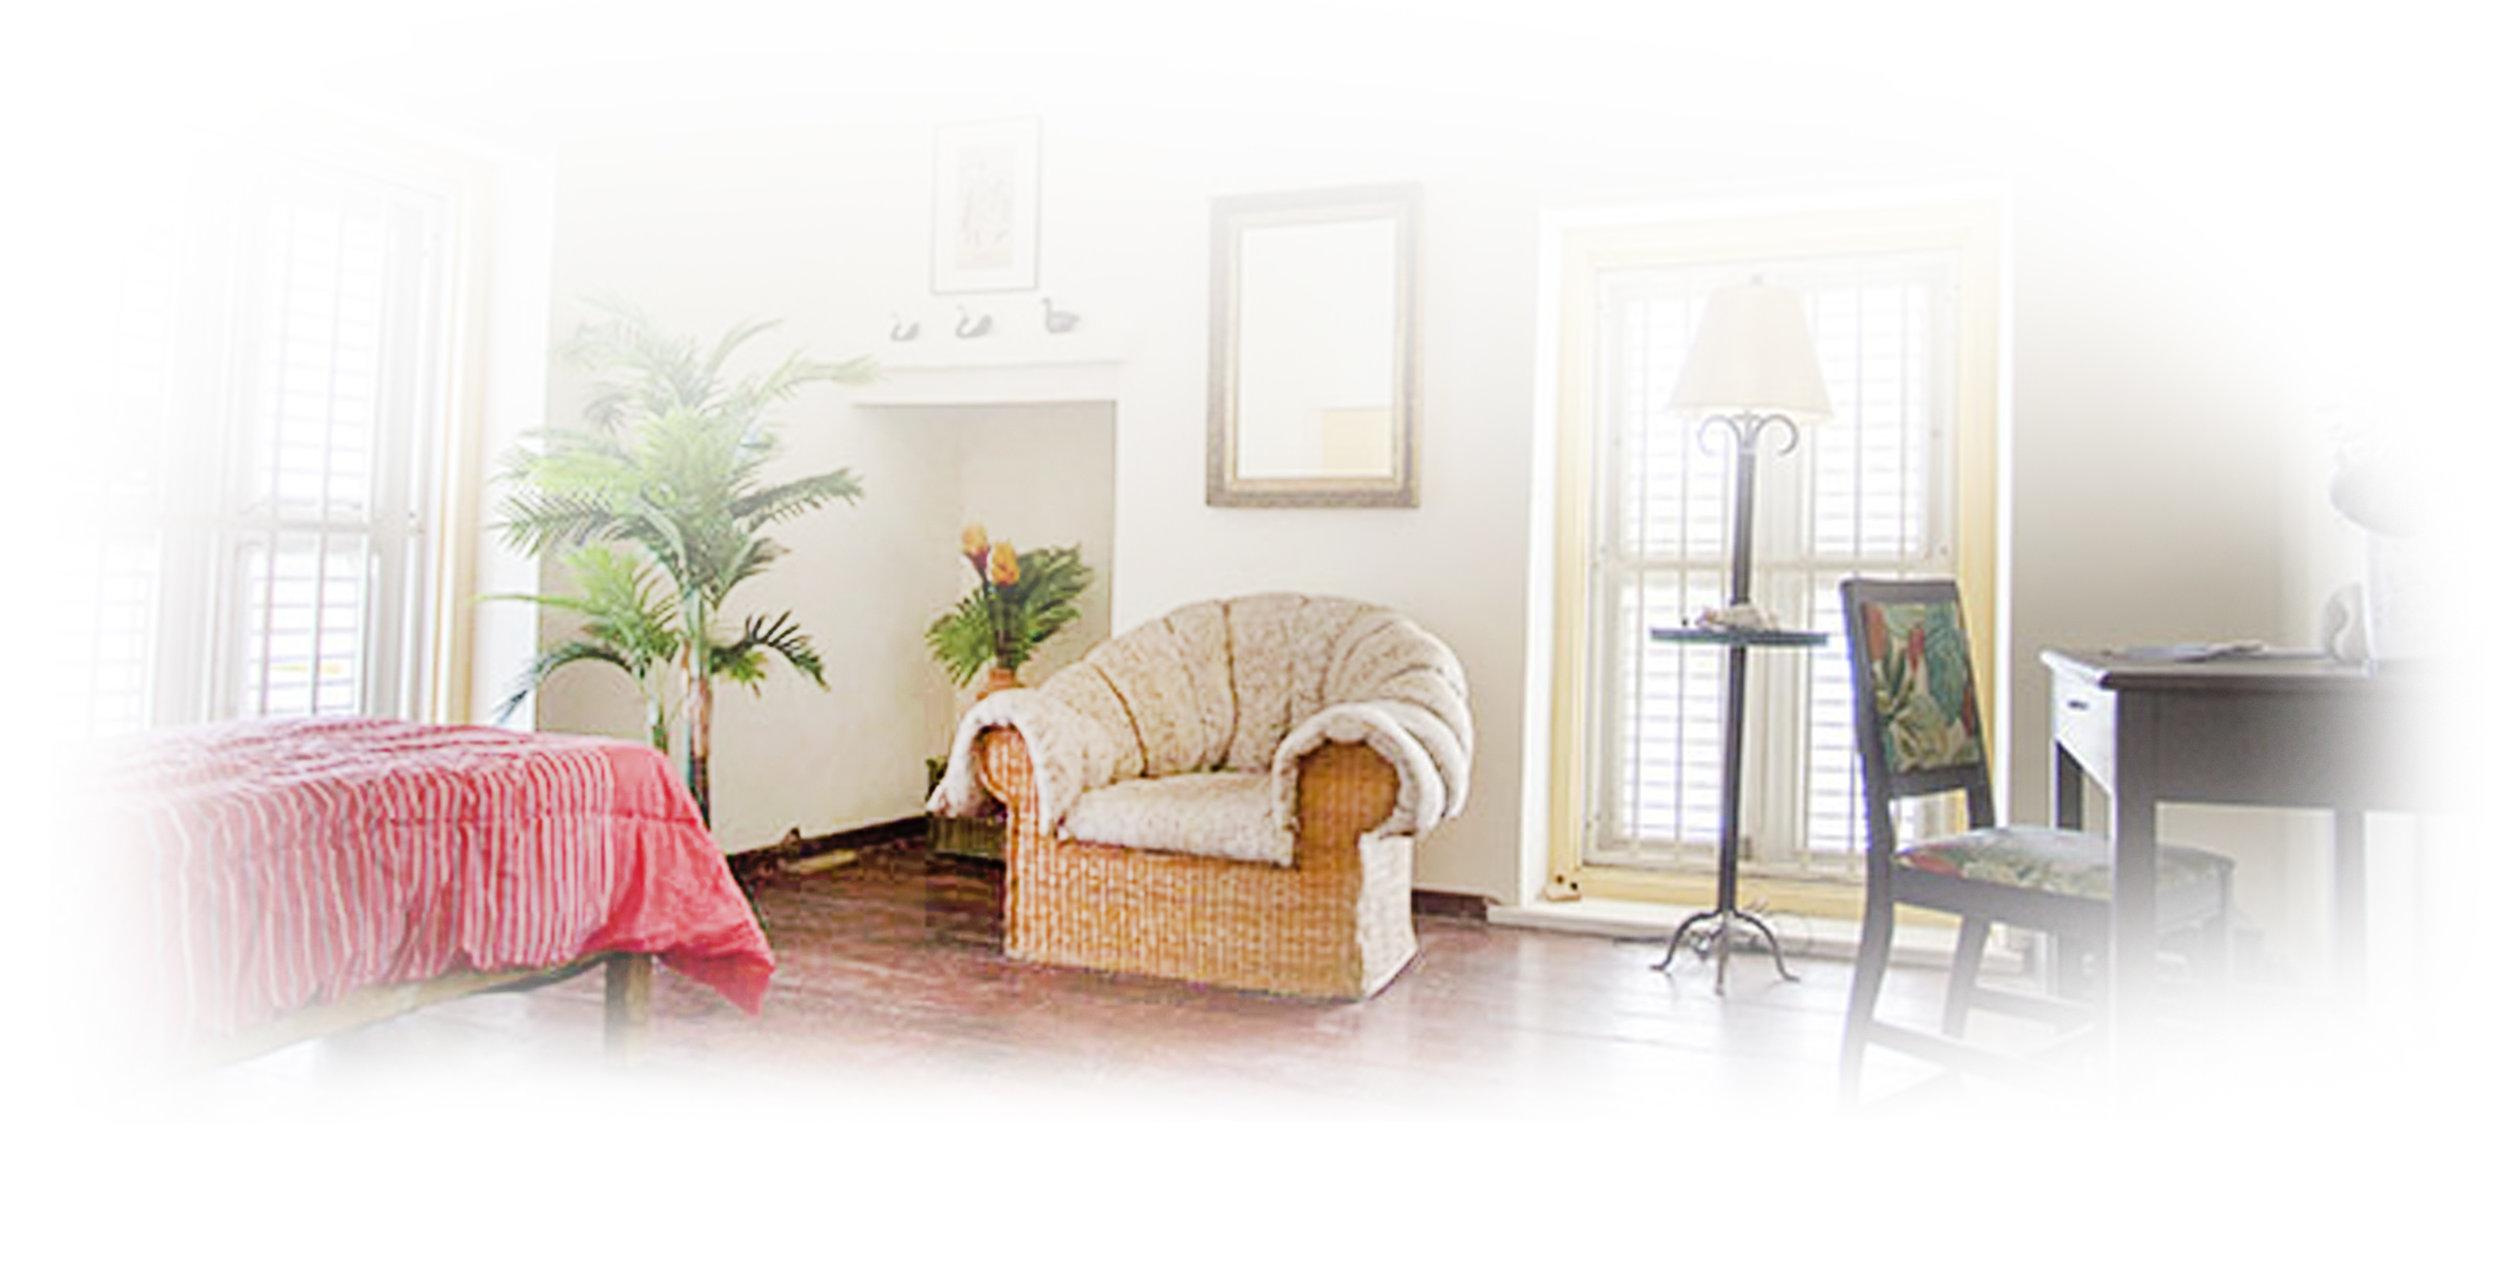 home-STAGEDESK-Curaçao-stagehuizen-2.jpg